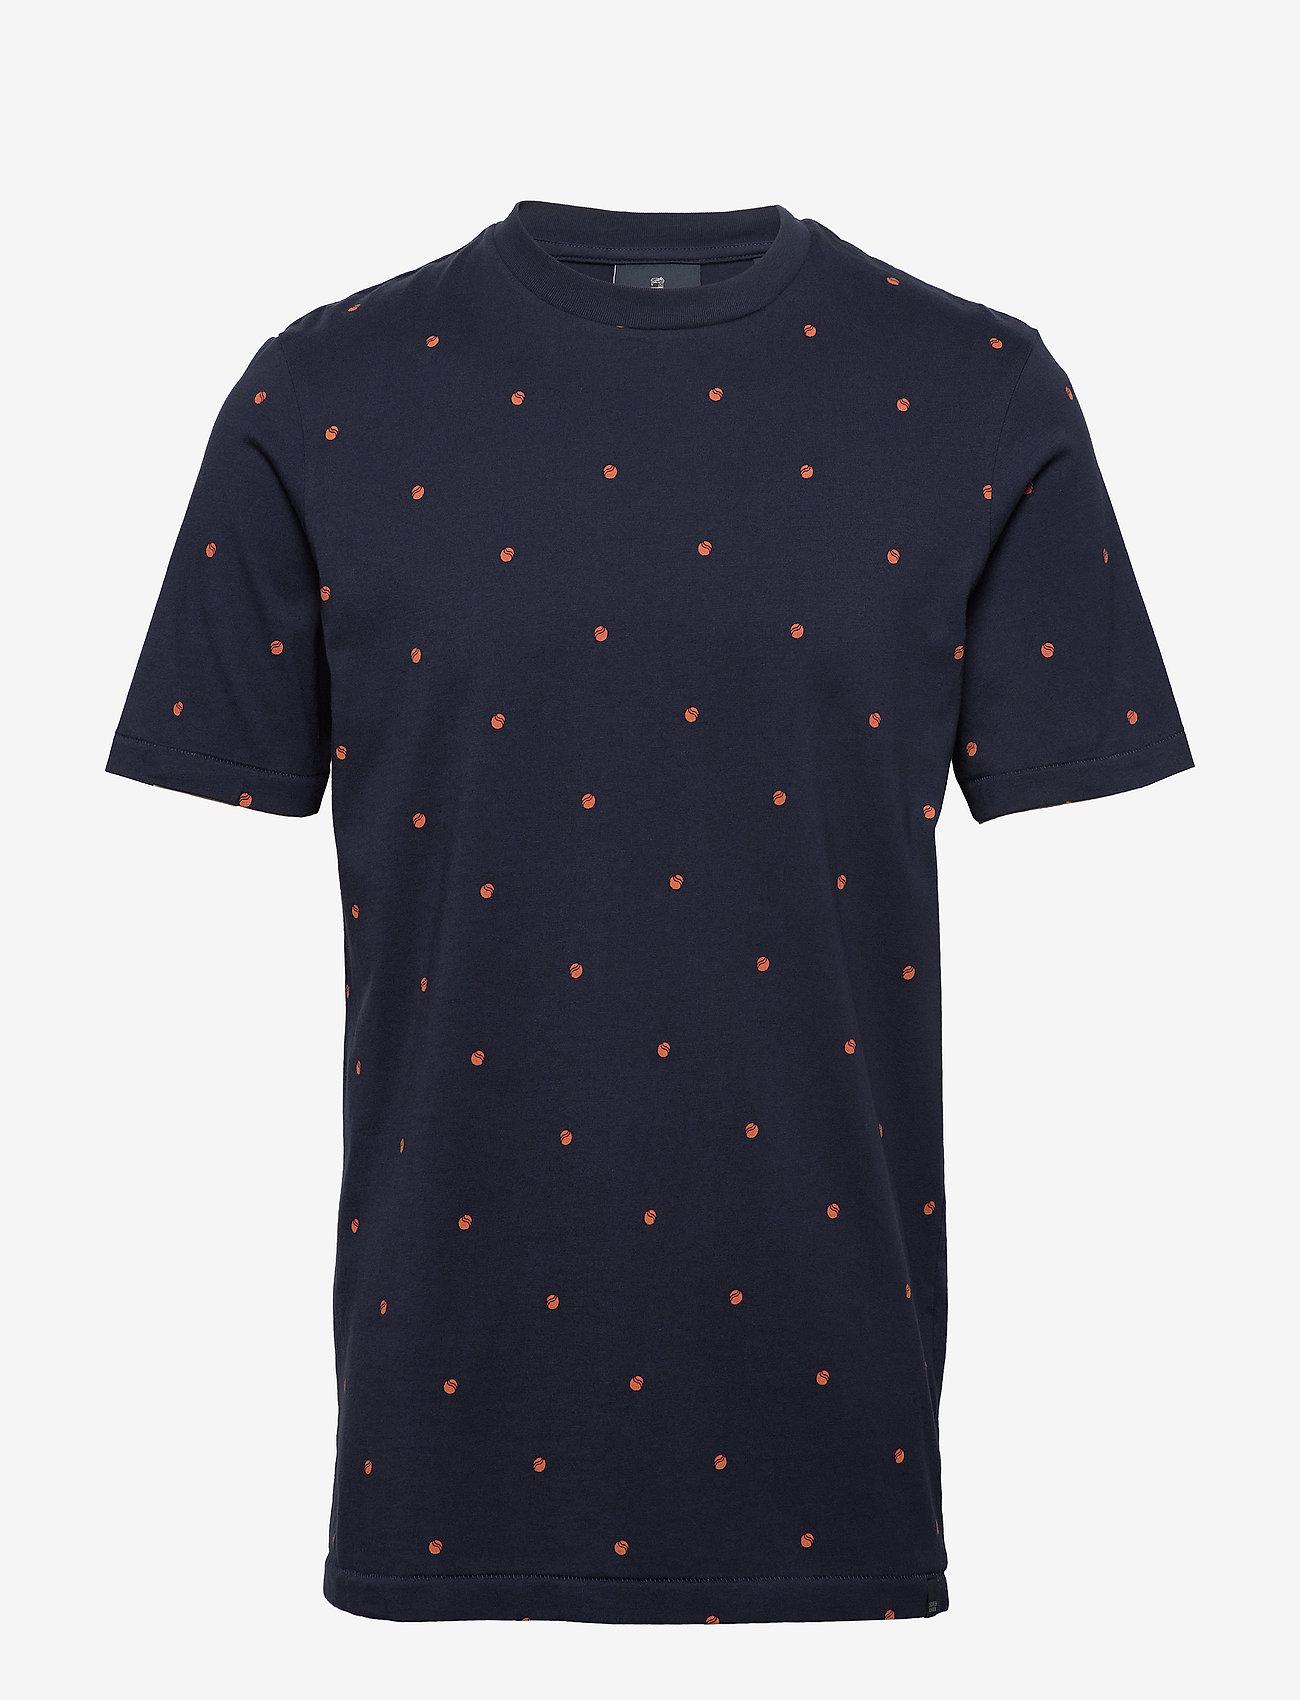 Scotch & Soda - Short sleeve tee with allover print - short-sleeved t-shirts - combo e - 0